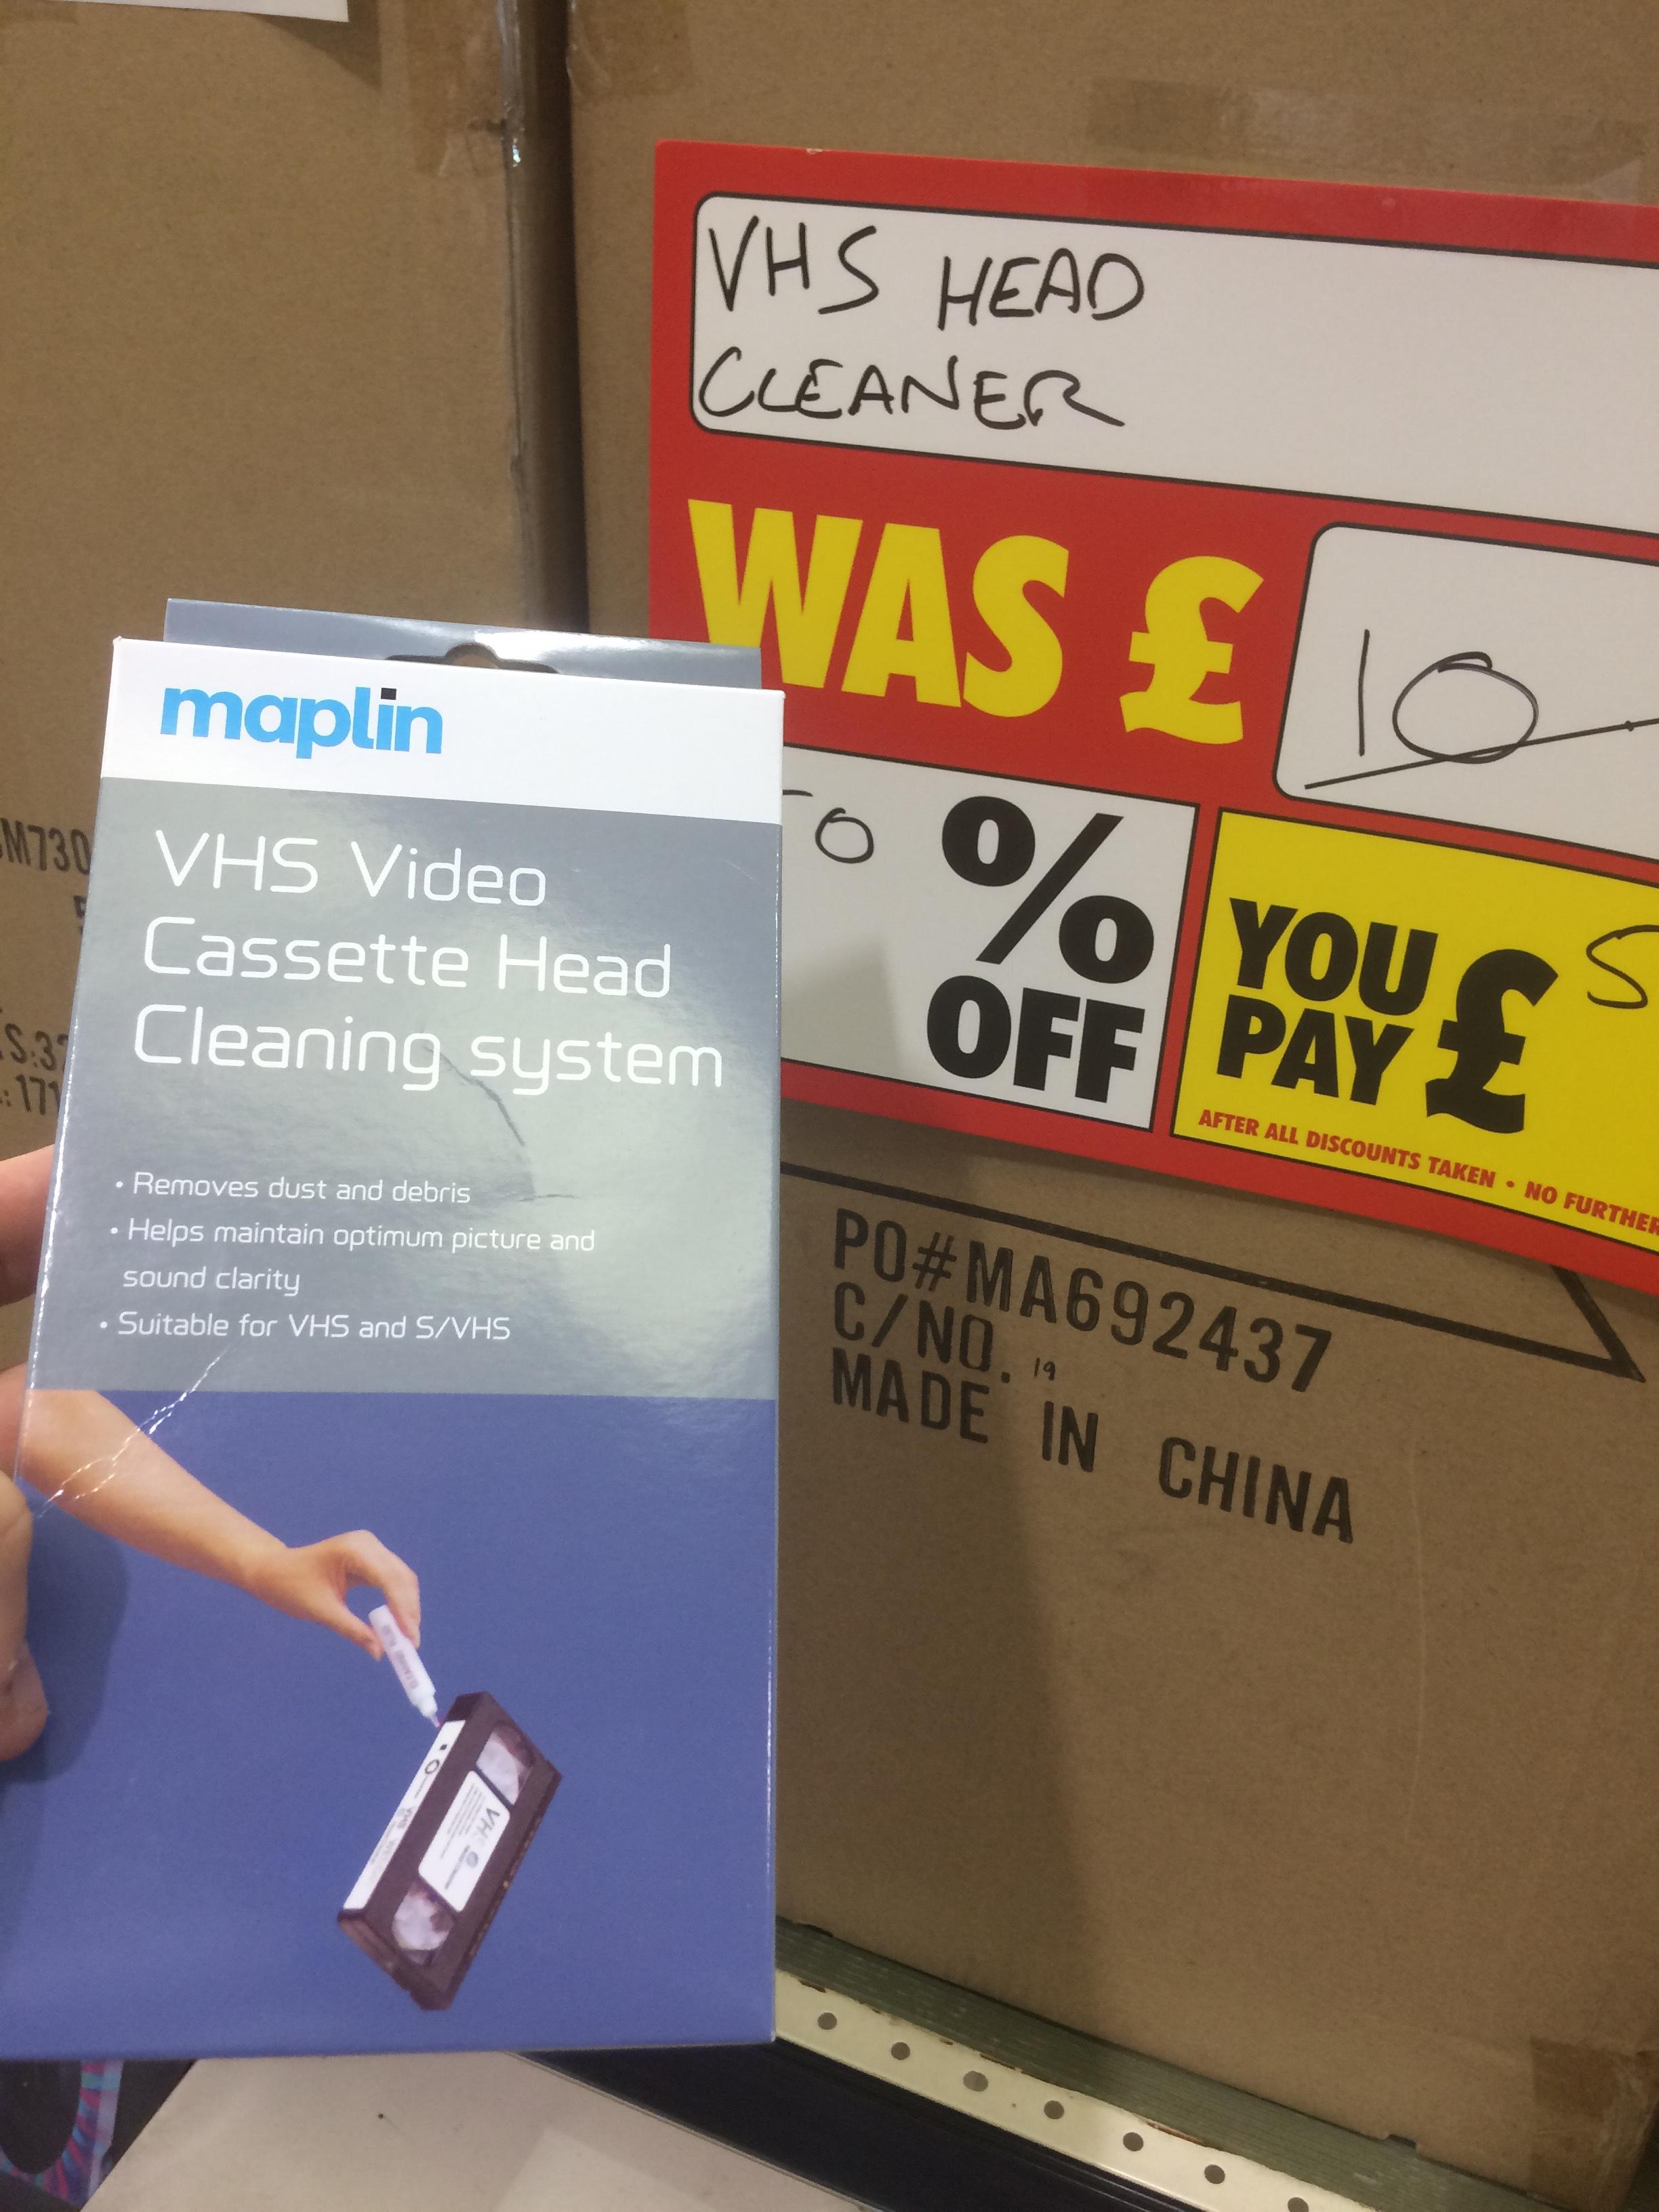 Maplin VHS head cleaner £5 - Lakeside Essex